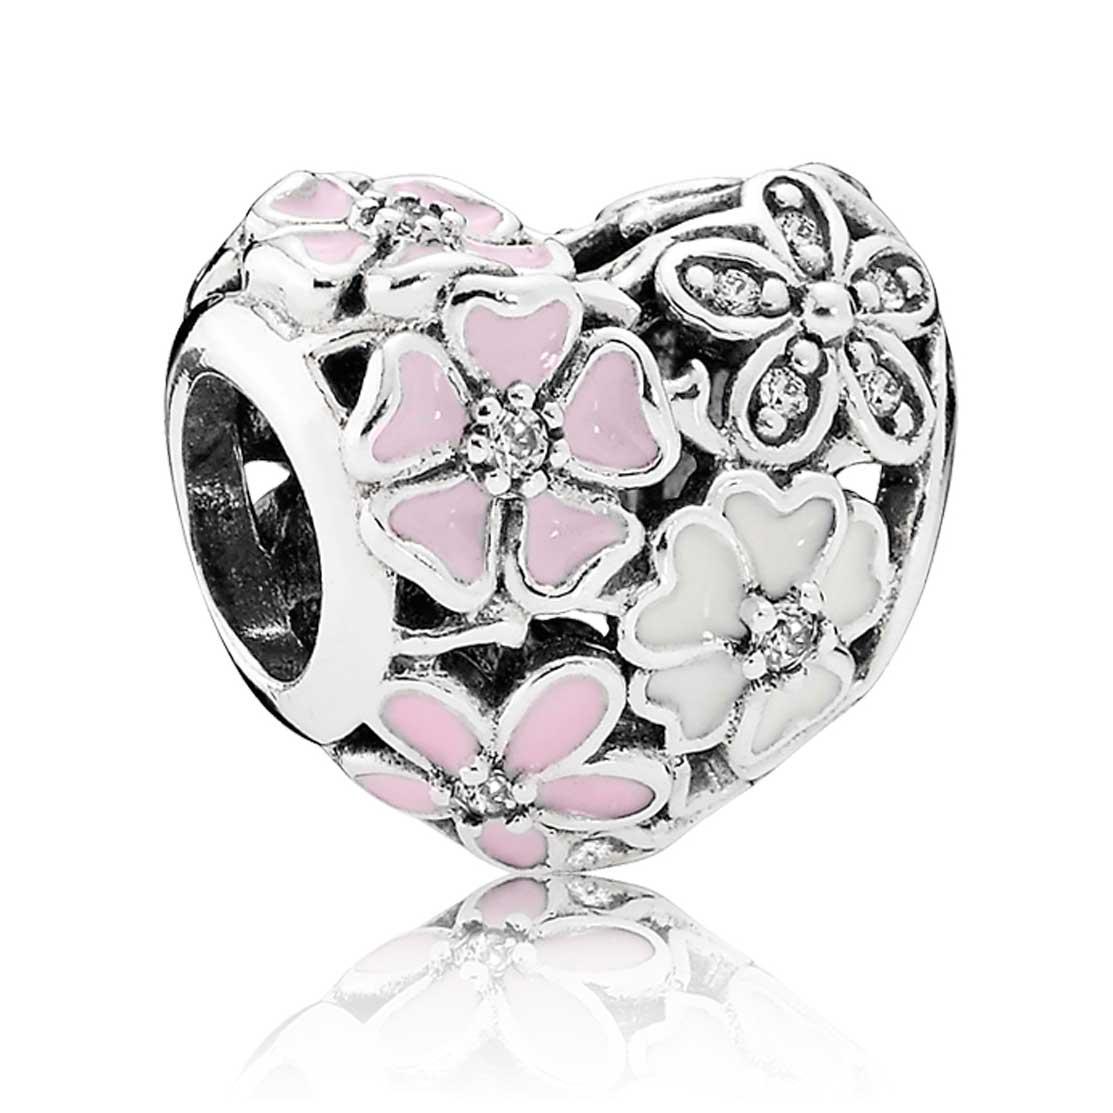 Pandora Earrings Heart: PANDORA Poetic Blooms Heart Charm: Precious Accents, Ltd